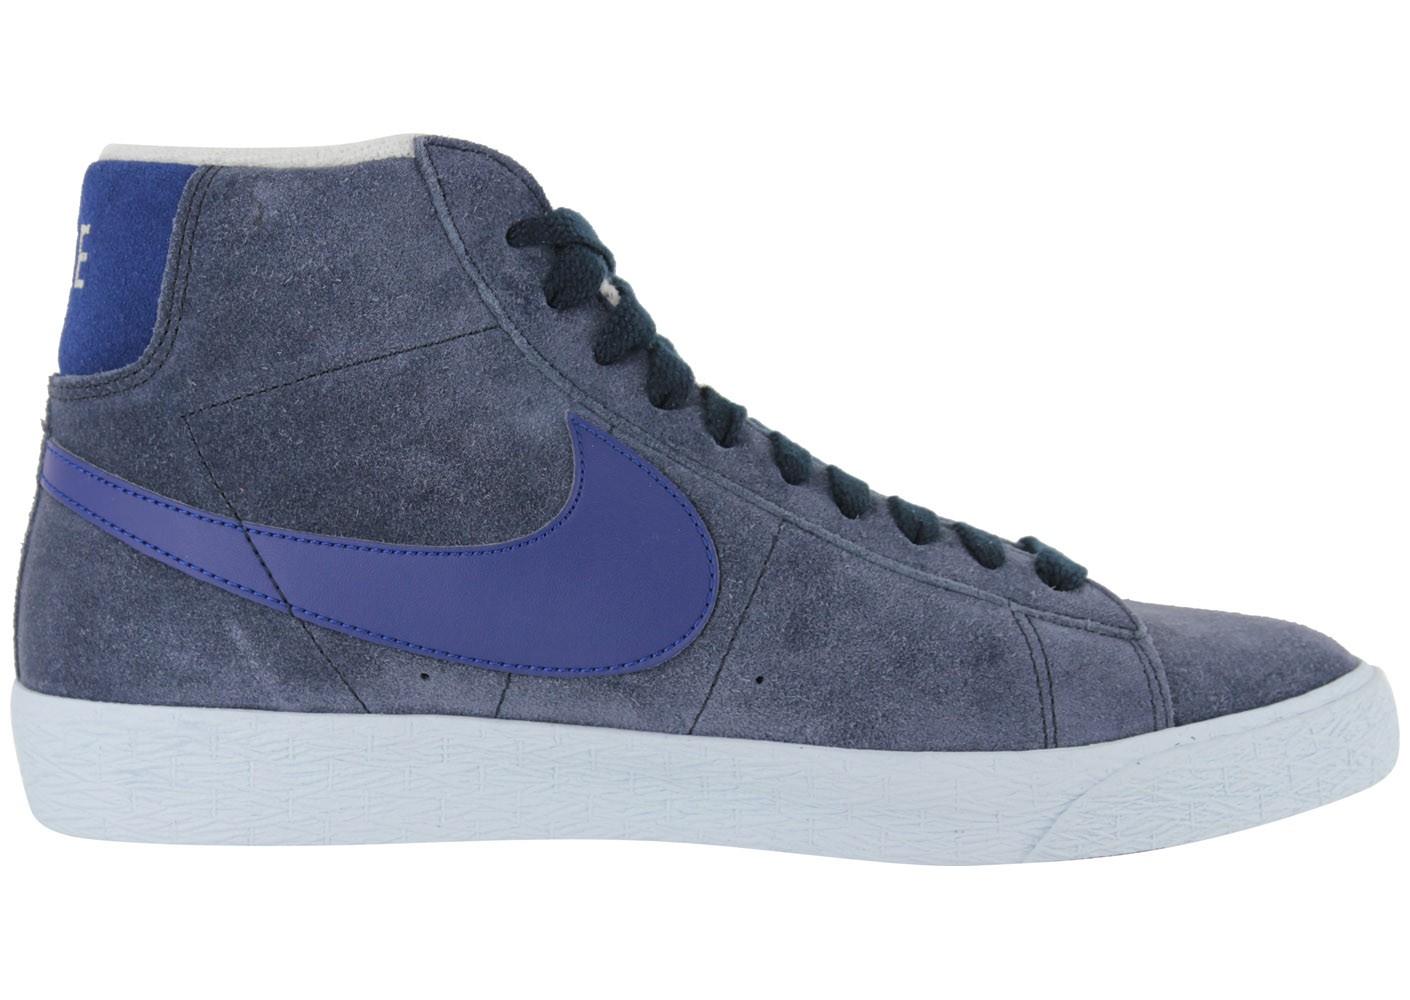 Nike blazer homme bleu marine cuir nike 360 basket - Blazer homme bleu marine ...